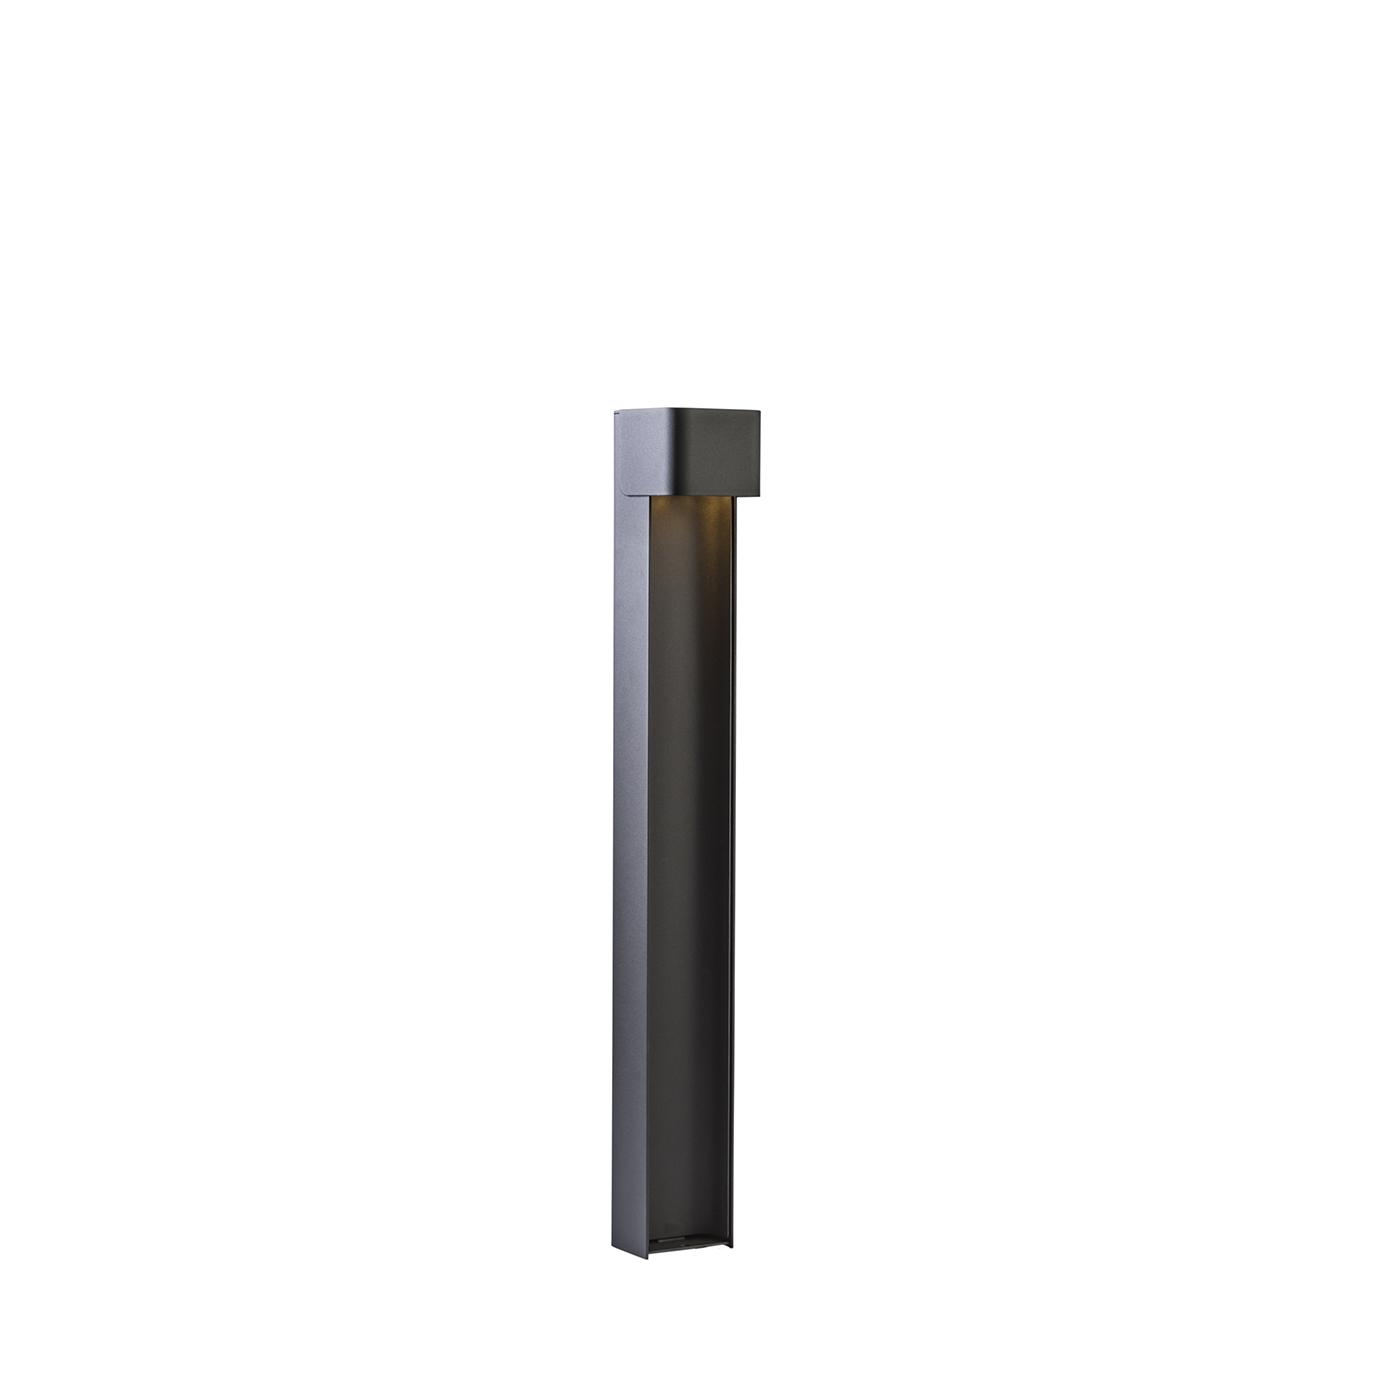 Belid Taurus Pullert Antracit H100cm 6W LED Dimbar